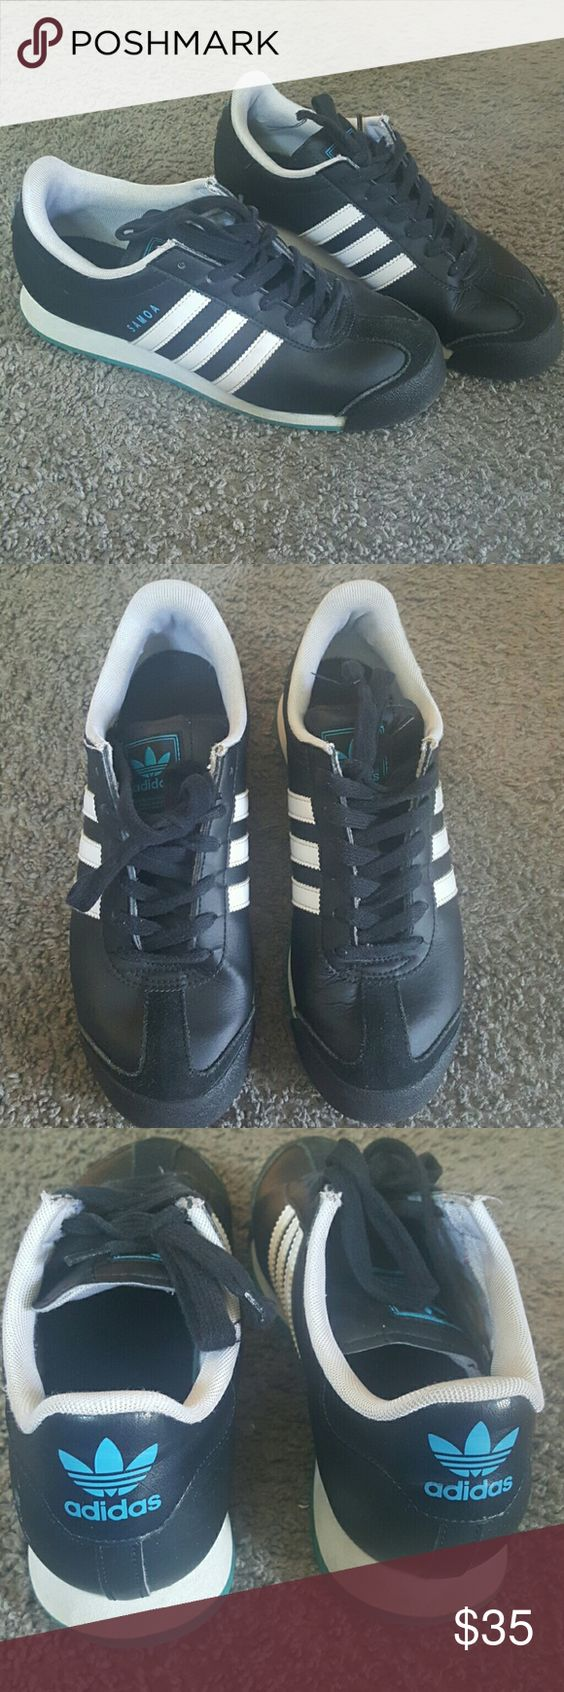 Adidas Samoa Size 5 Adidas Samoa Size 5. Black, white and blue. Good condition. Few scuff marks Adidas Shoes Sneakers